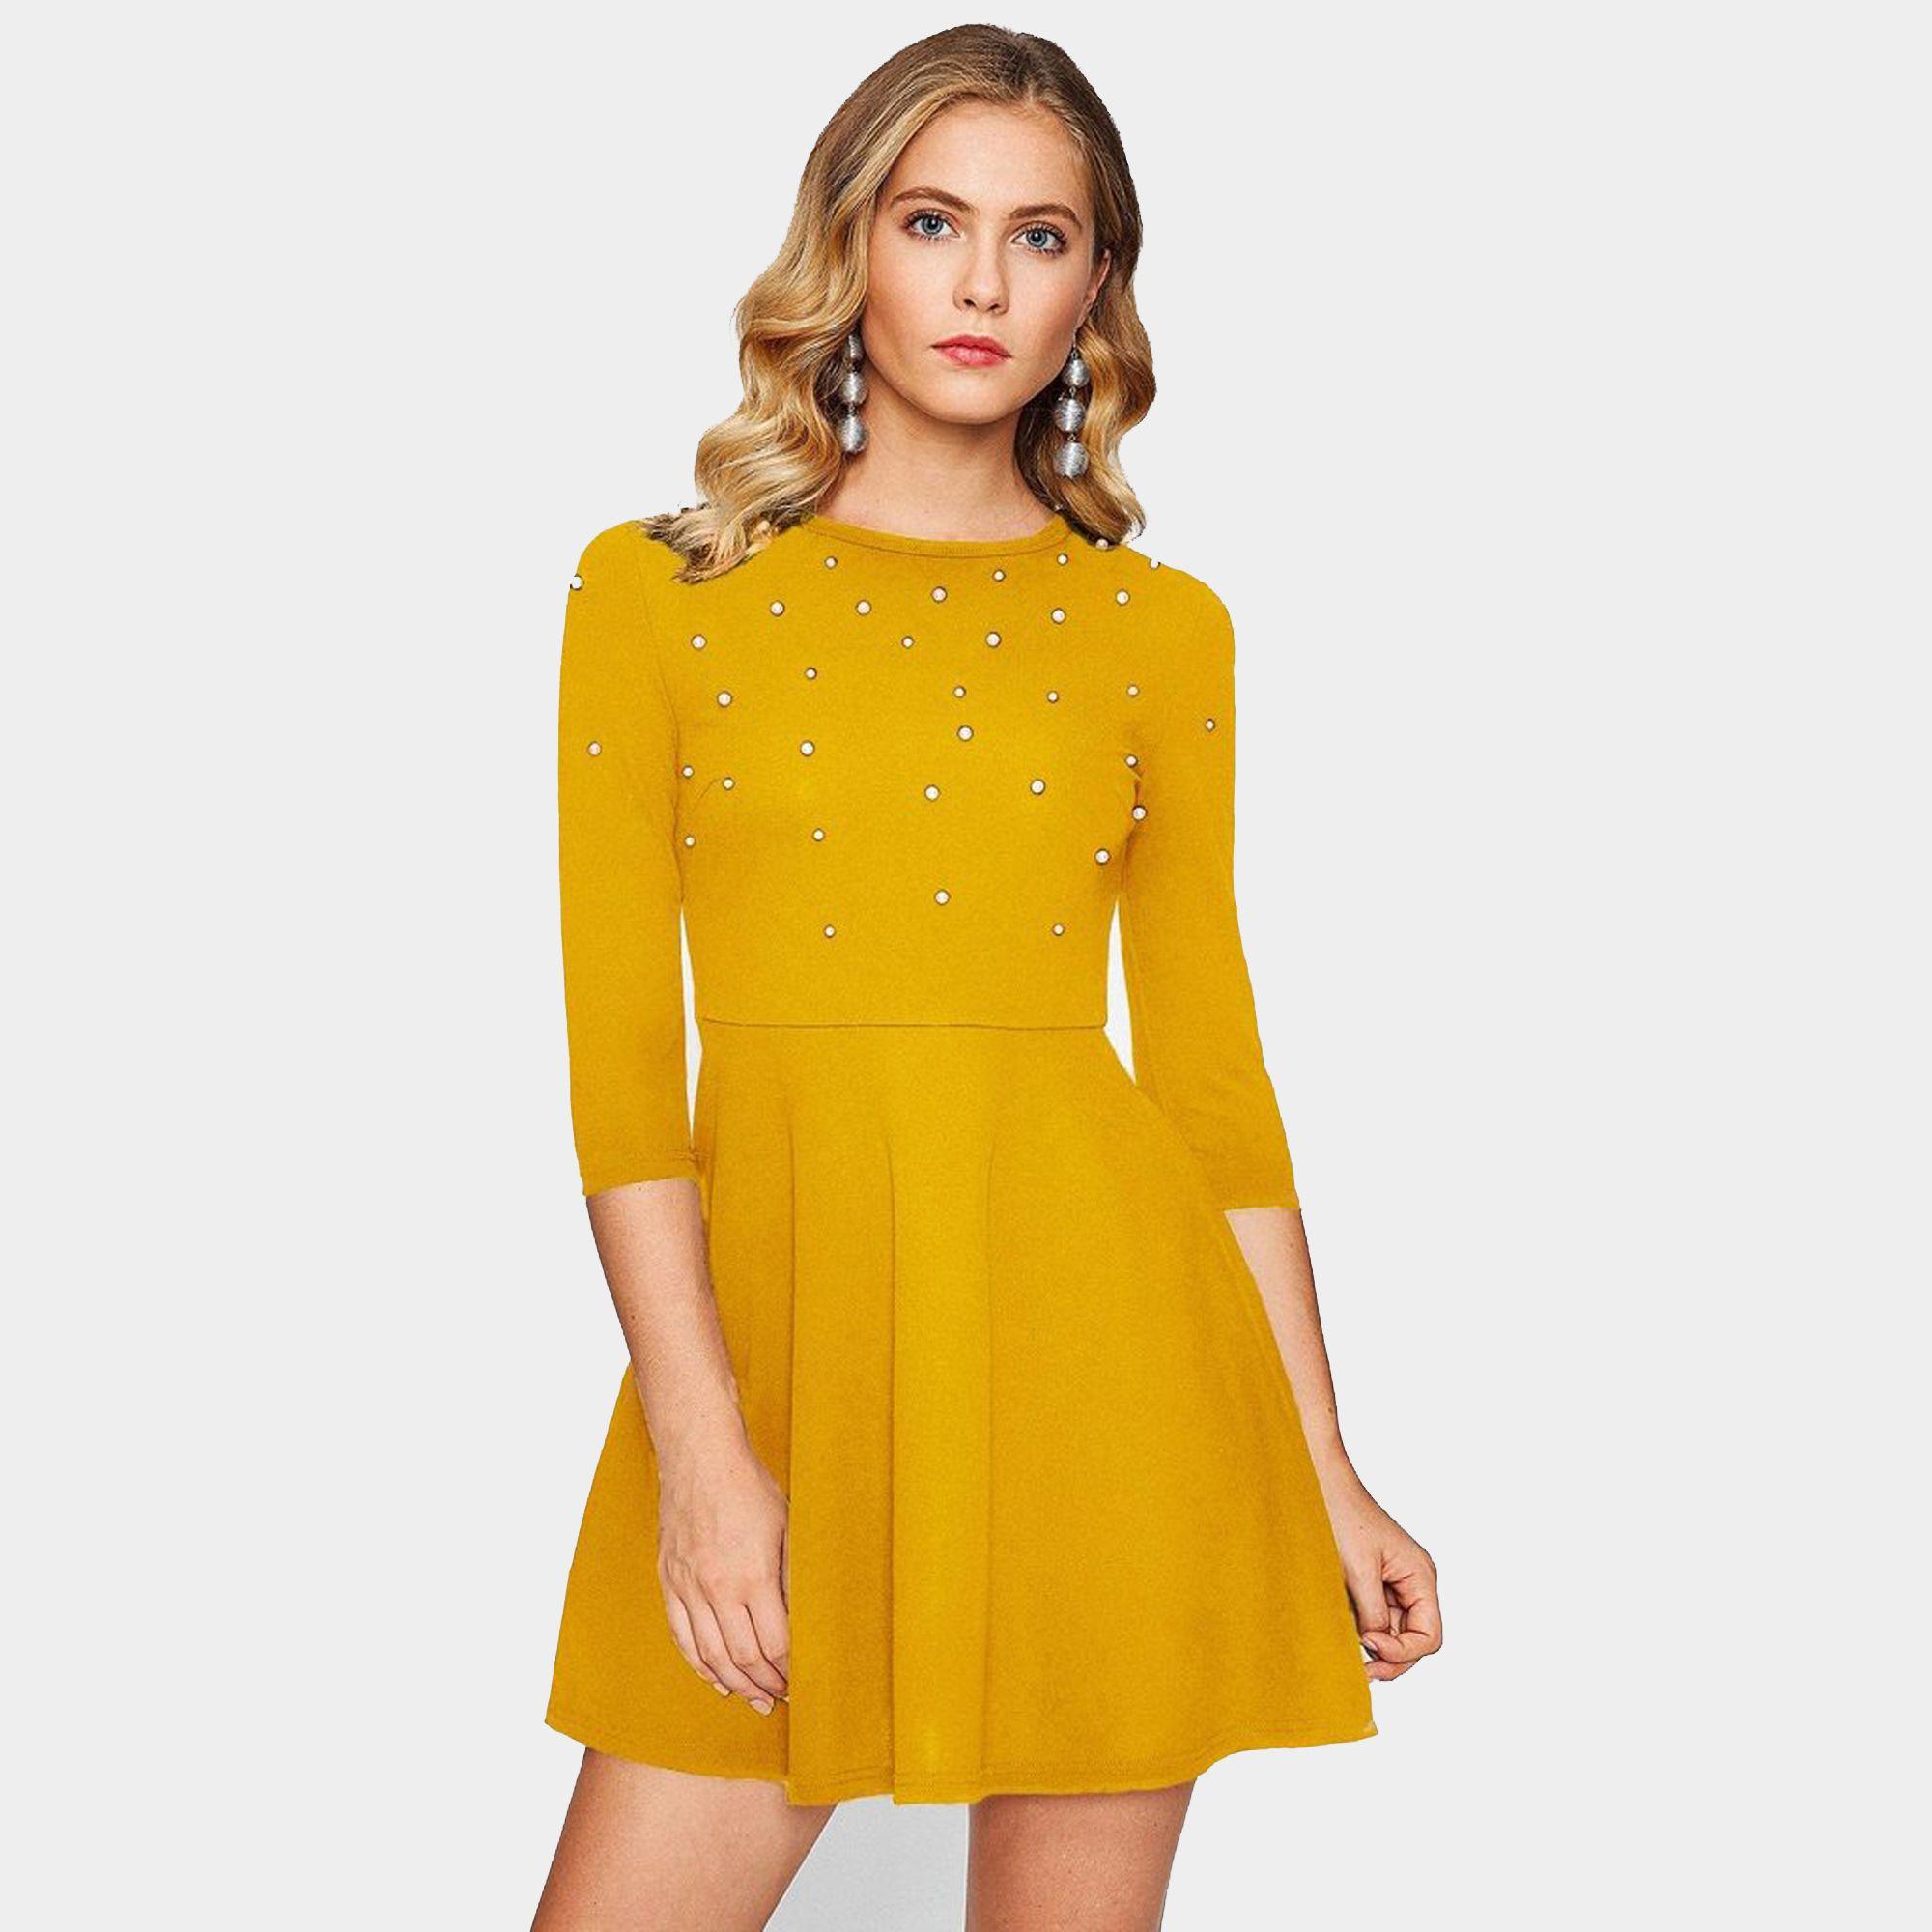 Addyvero Cotton Lycra Yellow Skater Dress